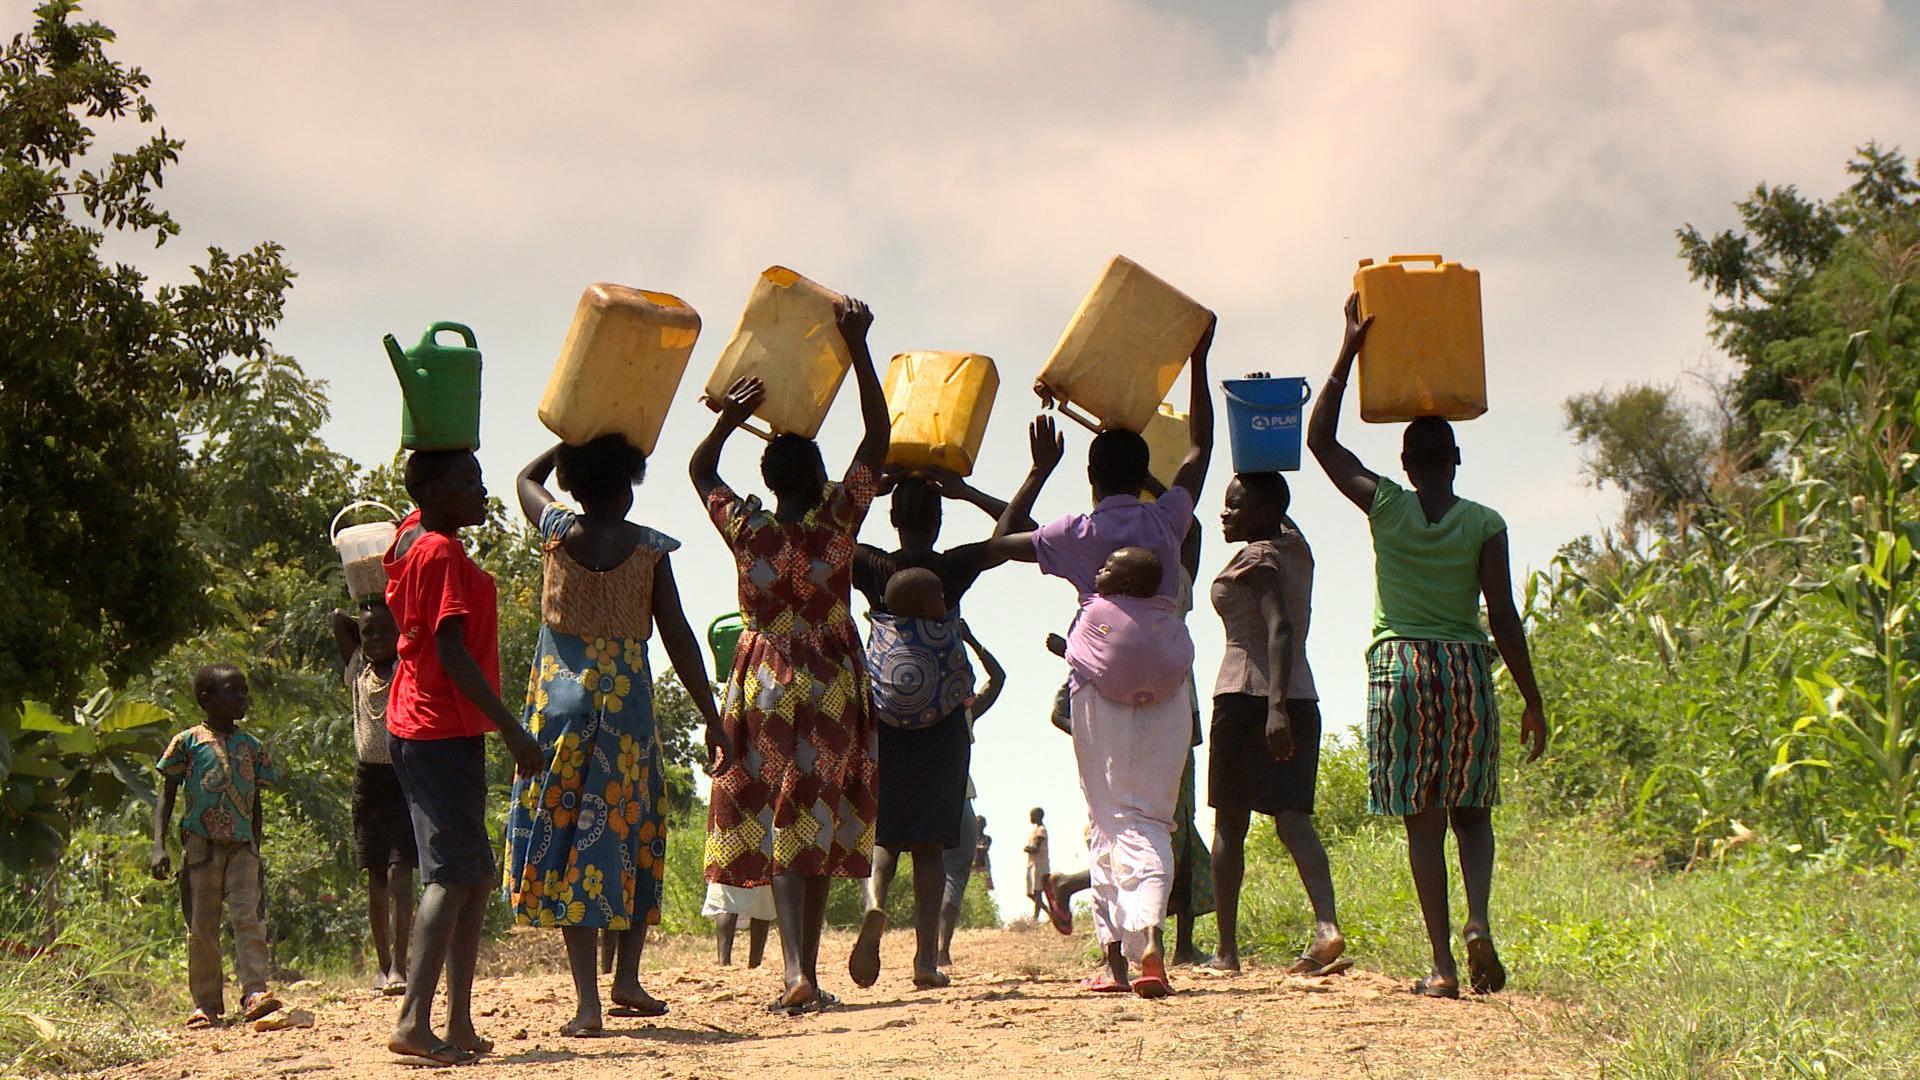 WEB2-AFRIQUE-WOMAN-ACN-20190910-91408.jpg